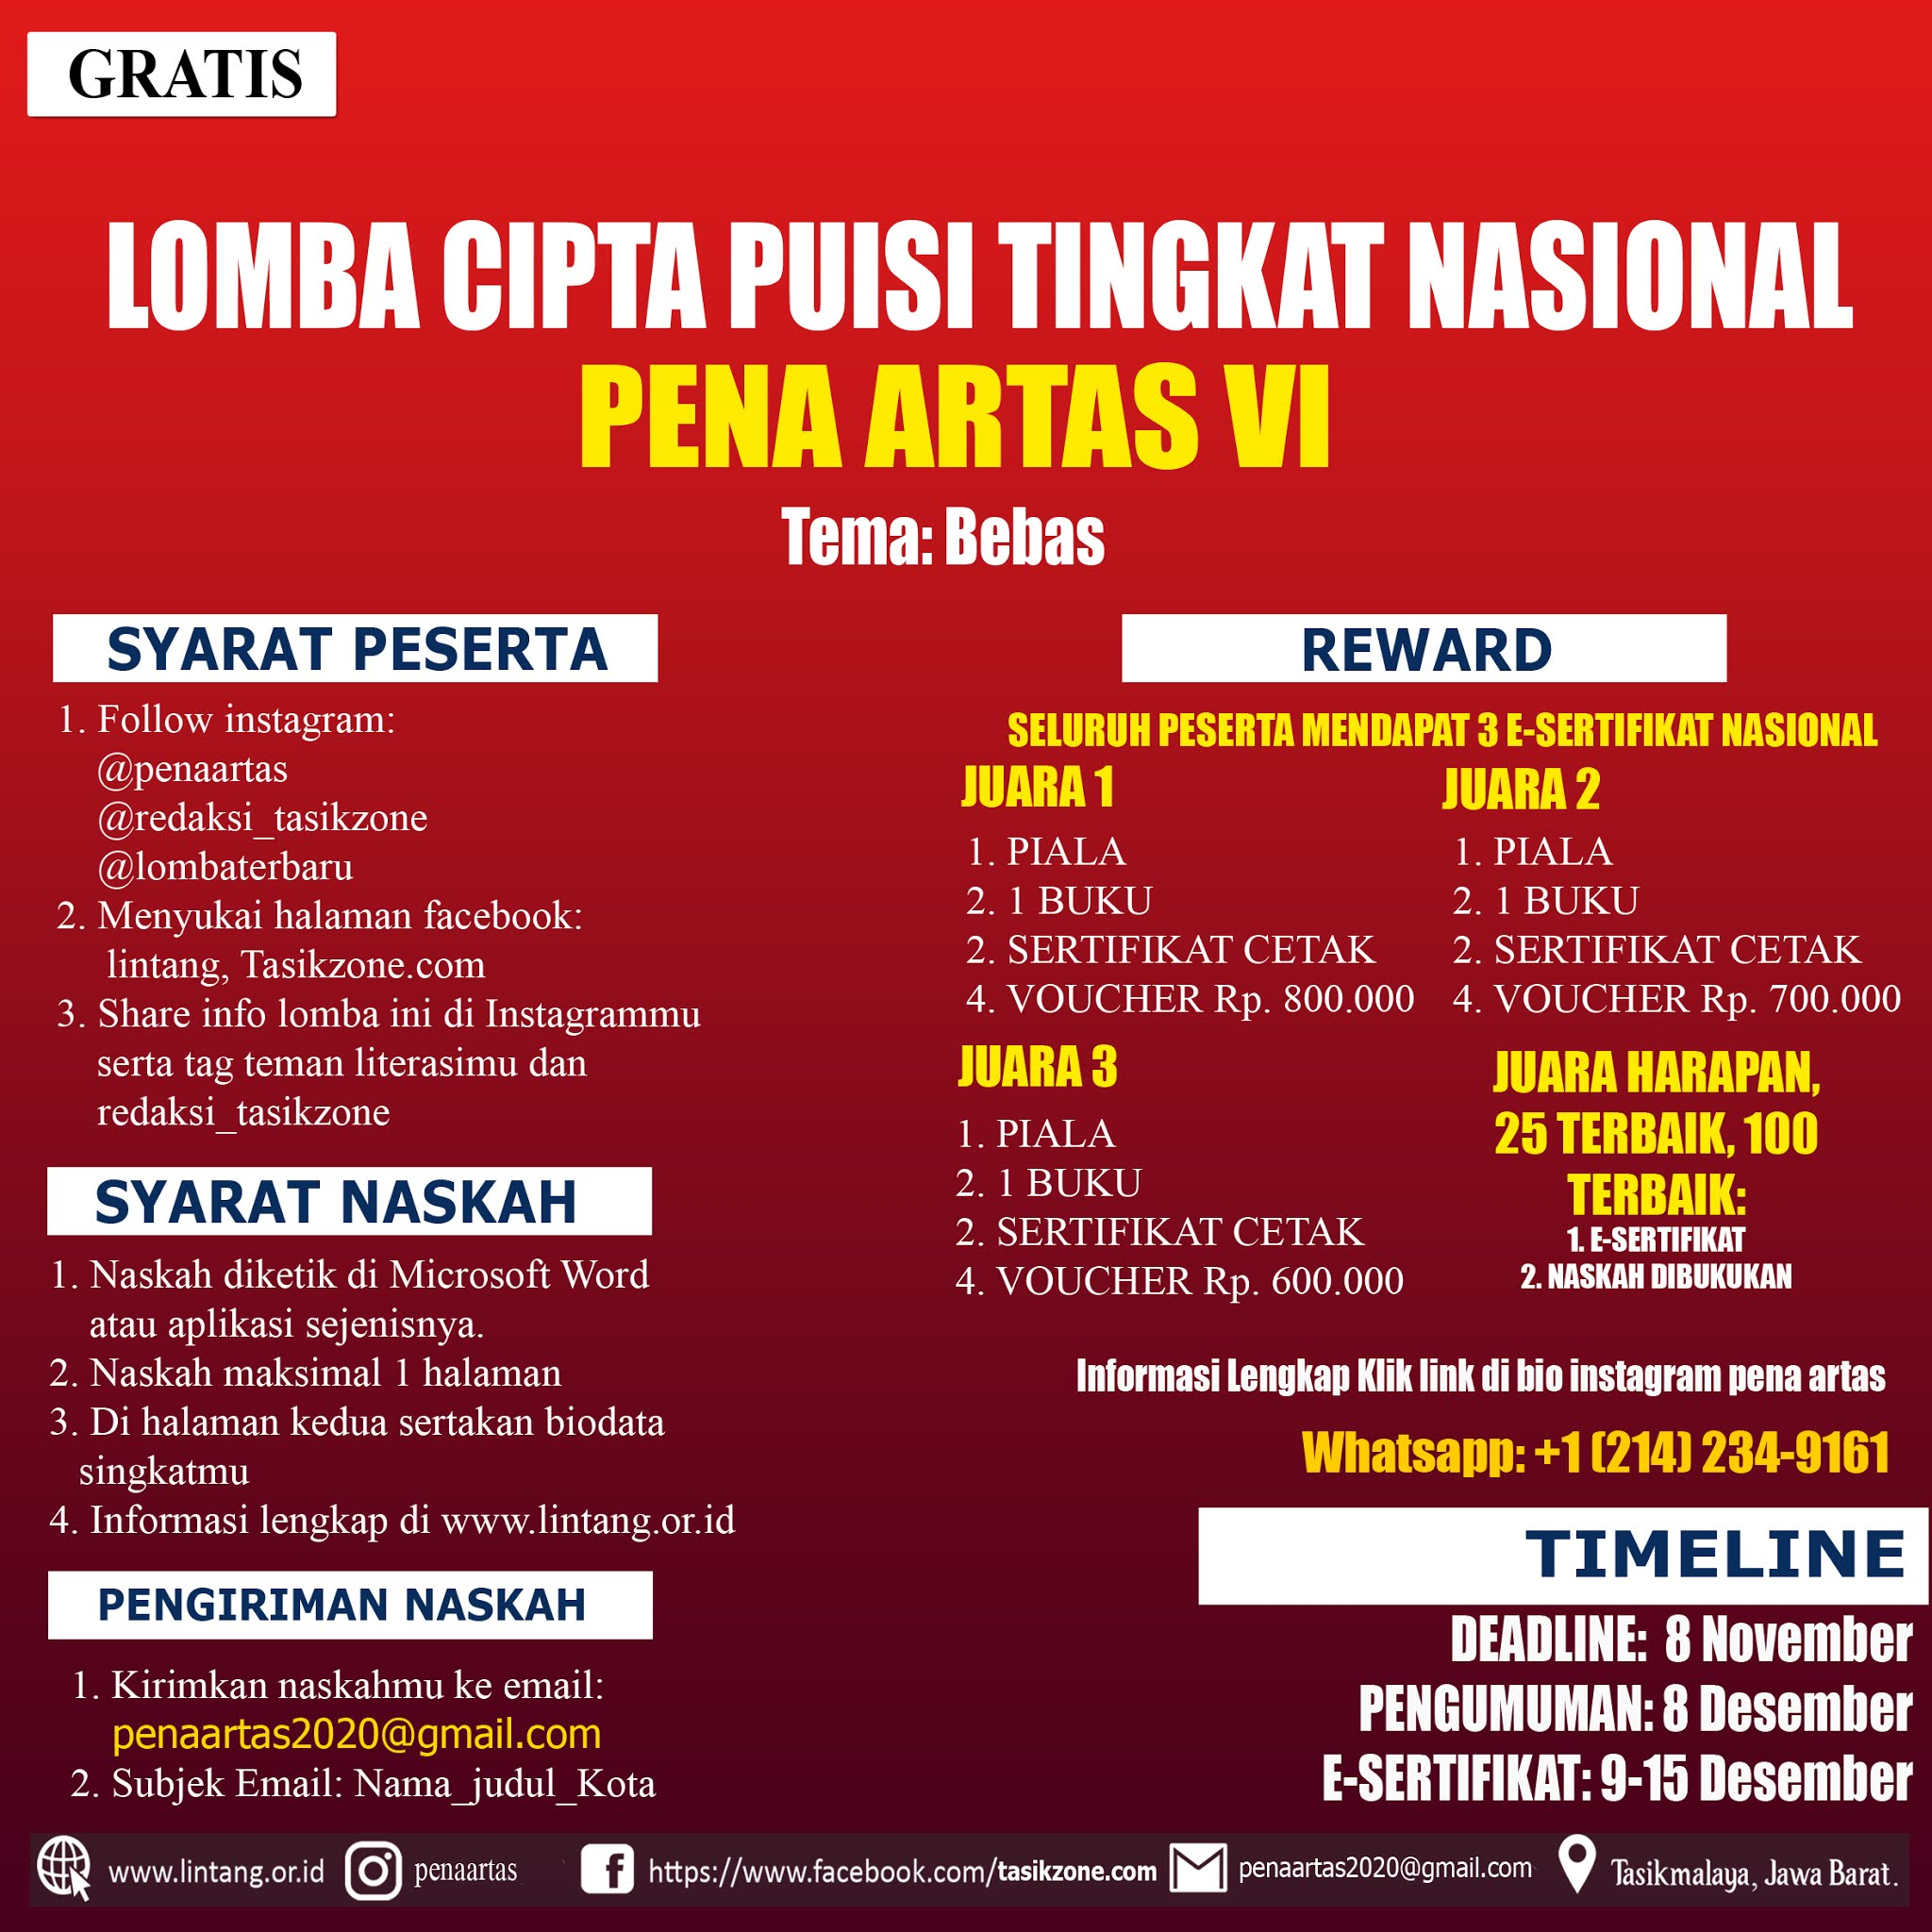 LOMBA CIPTA PUISI TINGKAT NASIONAL PENA ARTAS PART VI DEADLINE 08 NOVEMBER 2020